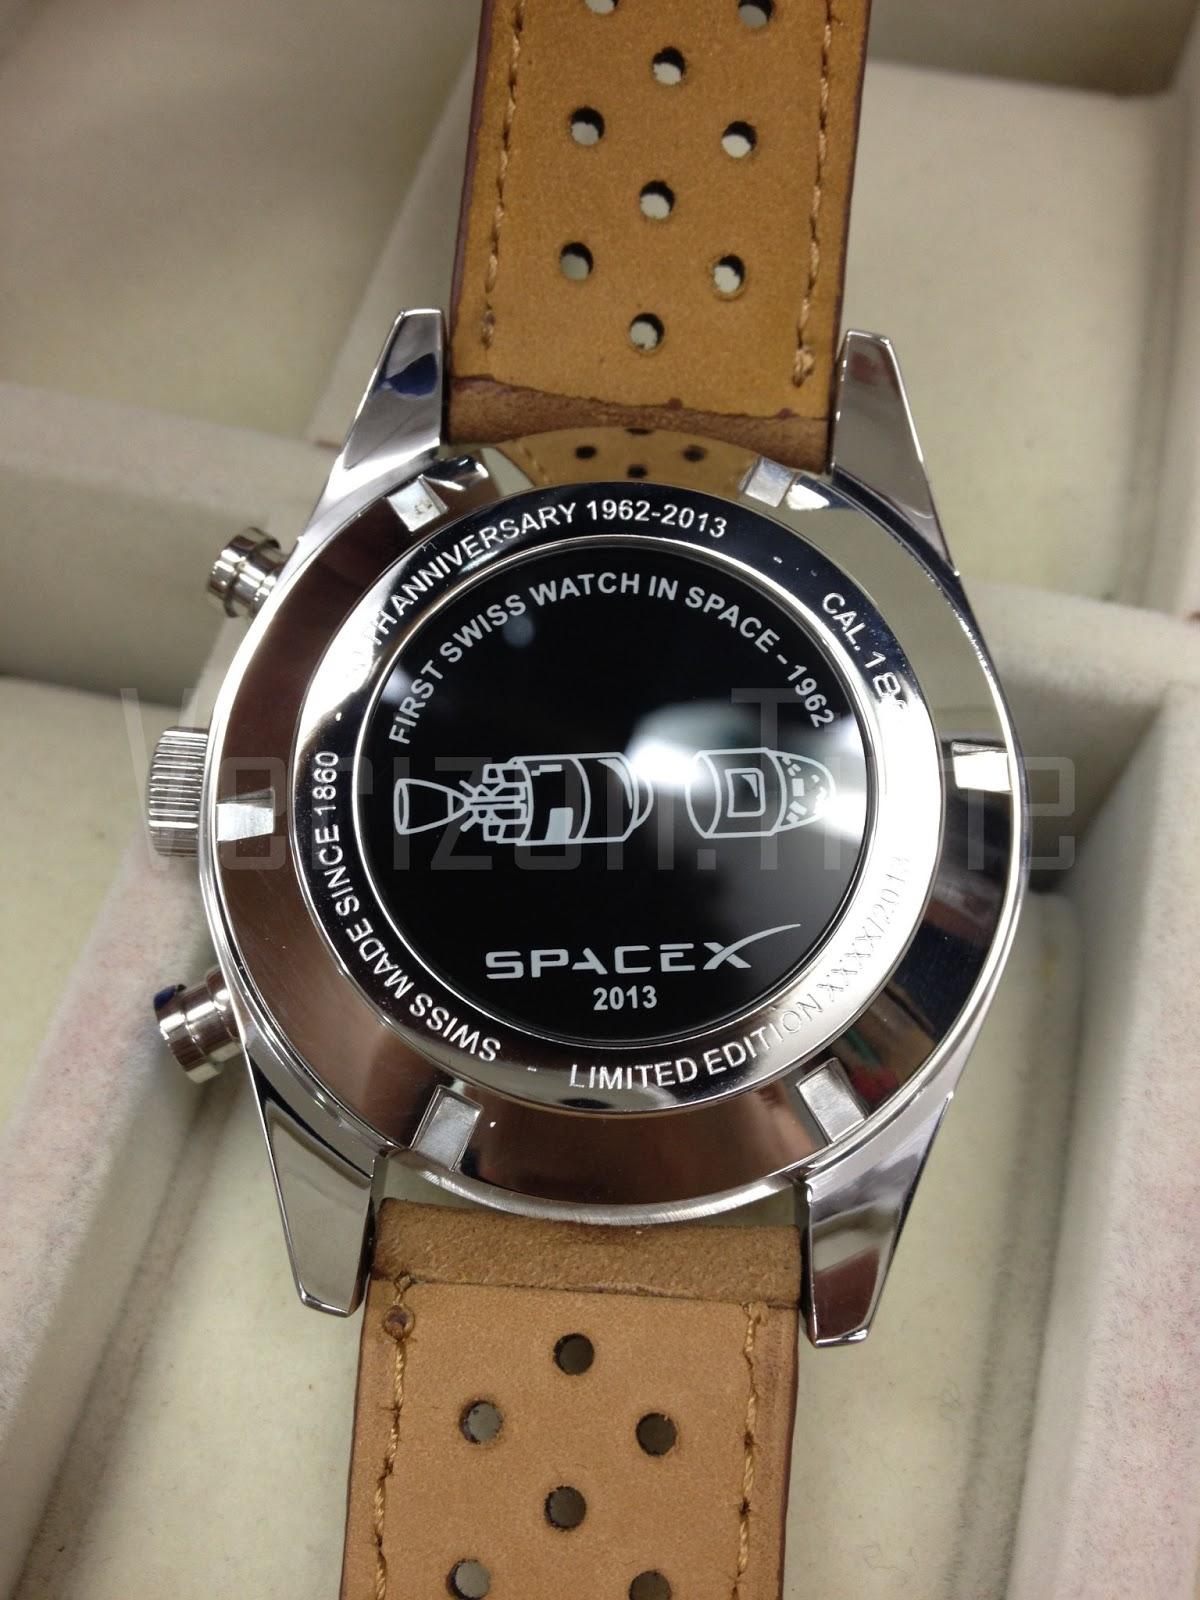 spacex black watch - photo #14